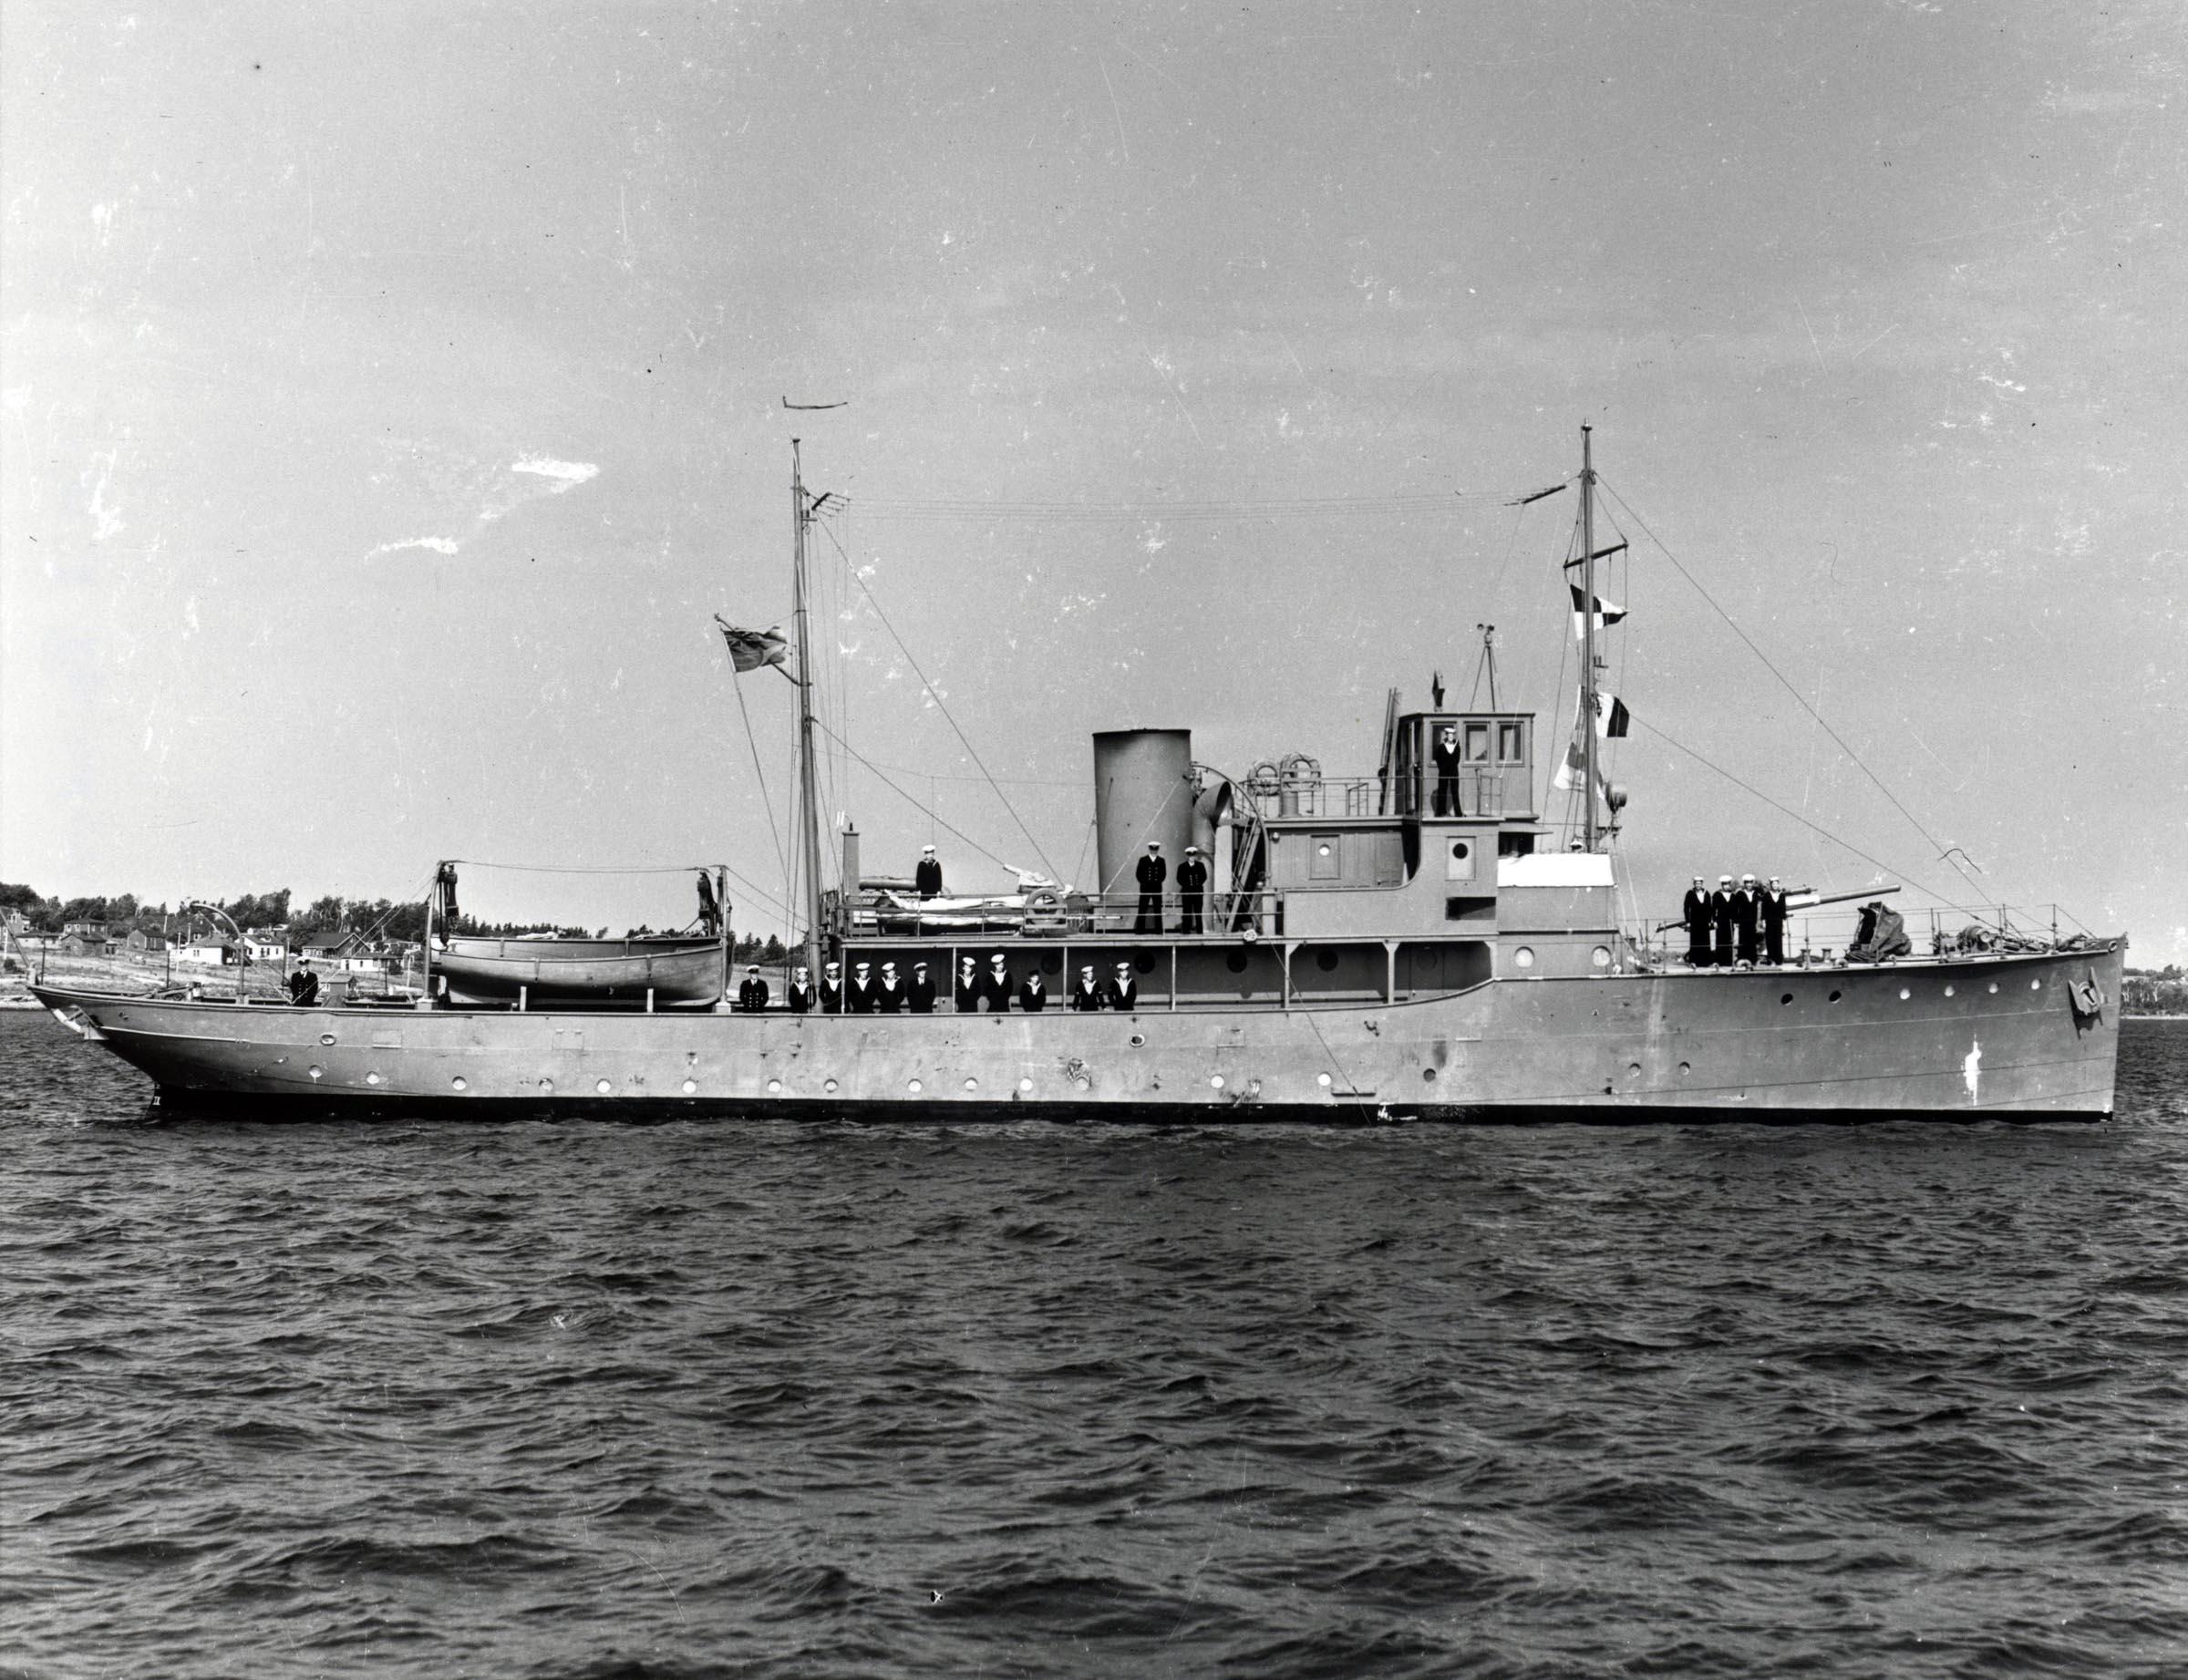 HMCS REINDEER